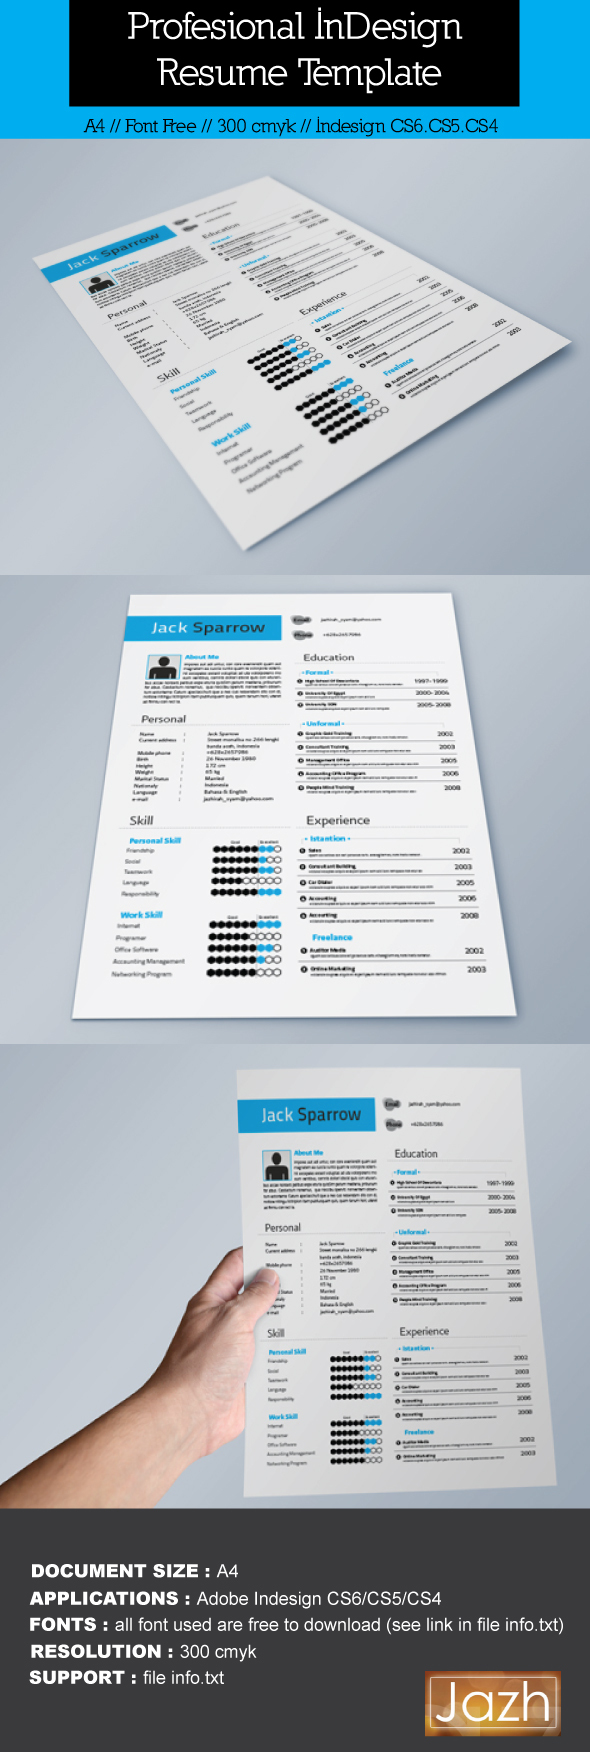 Indesign Resume Template by Jazhirah Ali Syam, via Behance ...